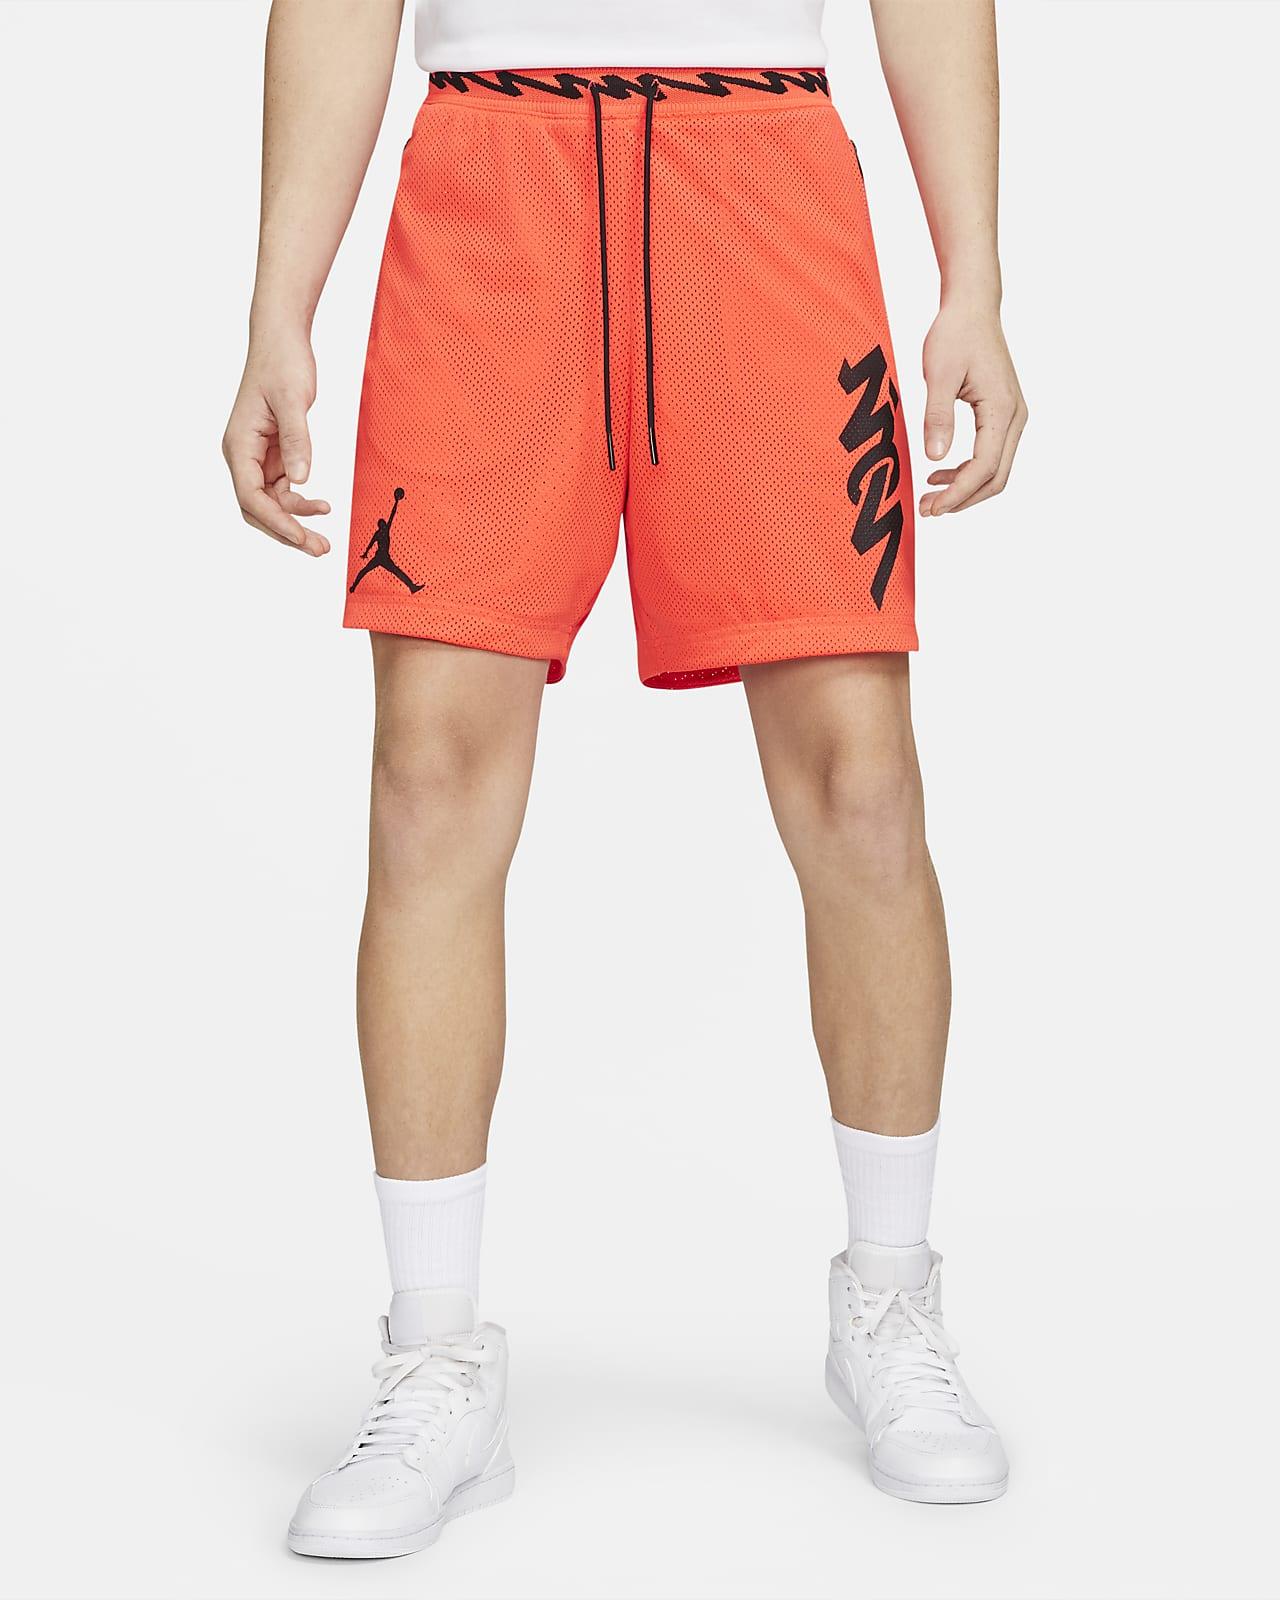 Jordan Dri-FIT Zion Men's Mesh Shorts